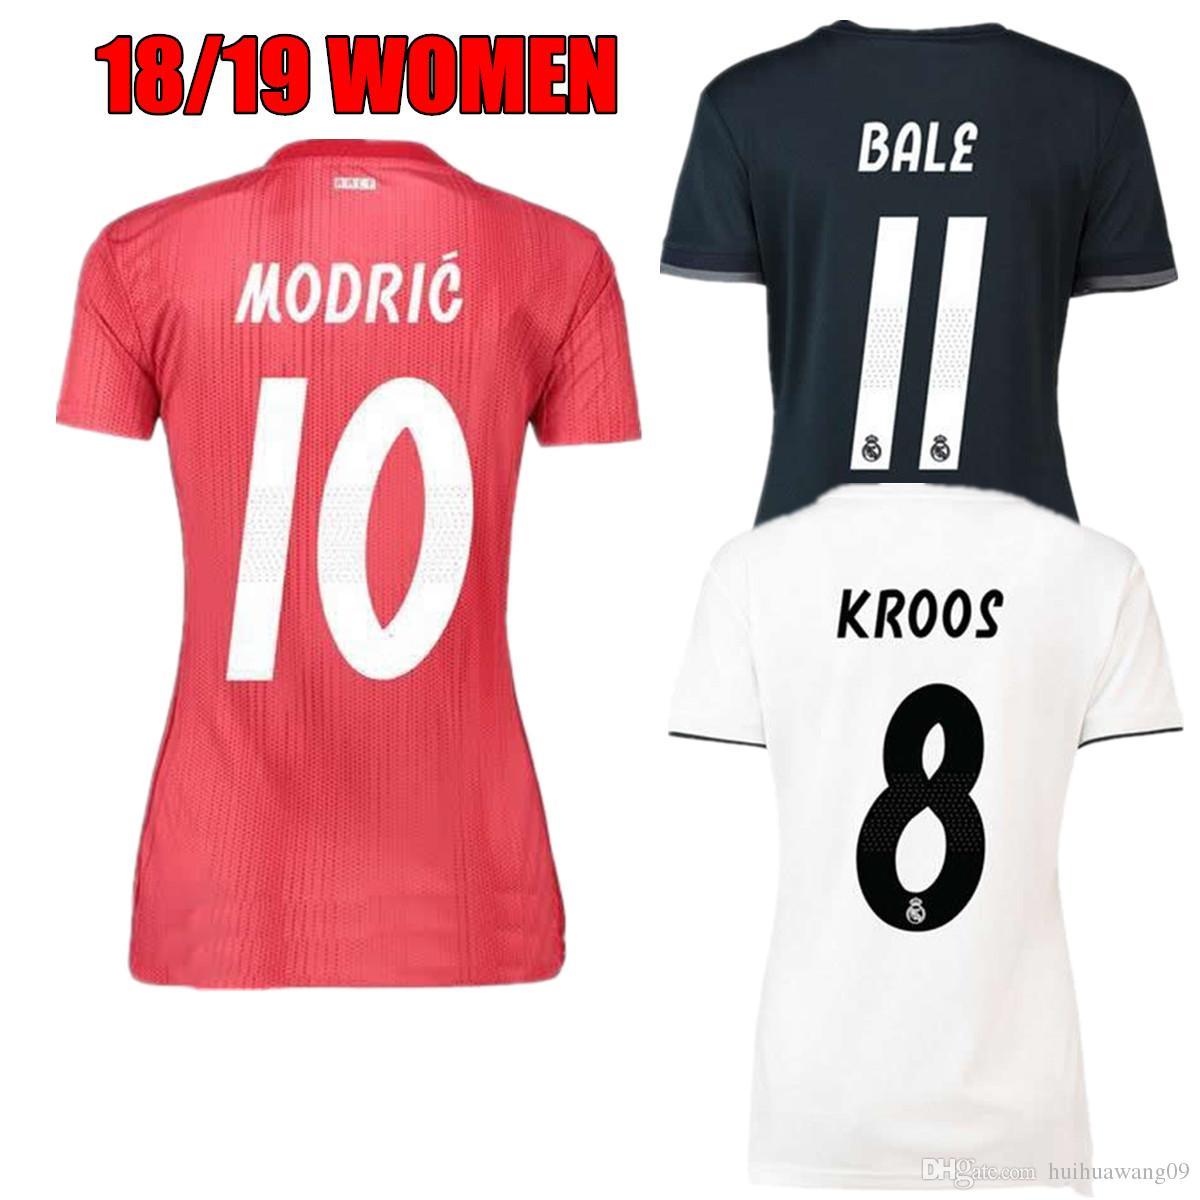 2018 2019 Mujeres Real Madrid Red Tercera Camiseta De Fútbol Asensio SERGIO  MODRIC RAMOS MARCELO BALE ISCO Camiseta KROOS 18 19 Camisetas De Fútbol De  Local ... e5d36671c03ba